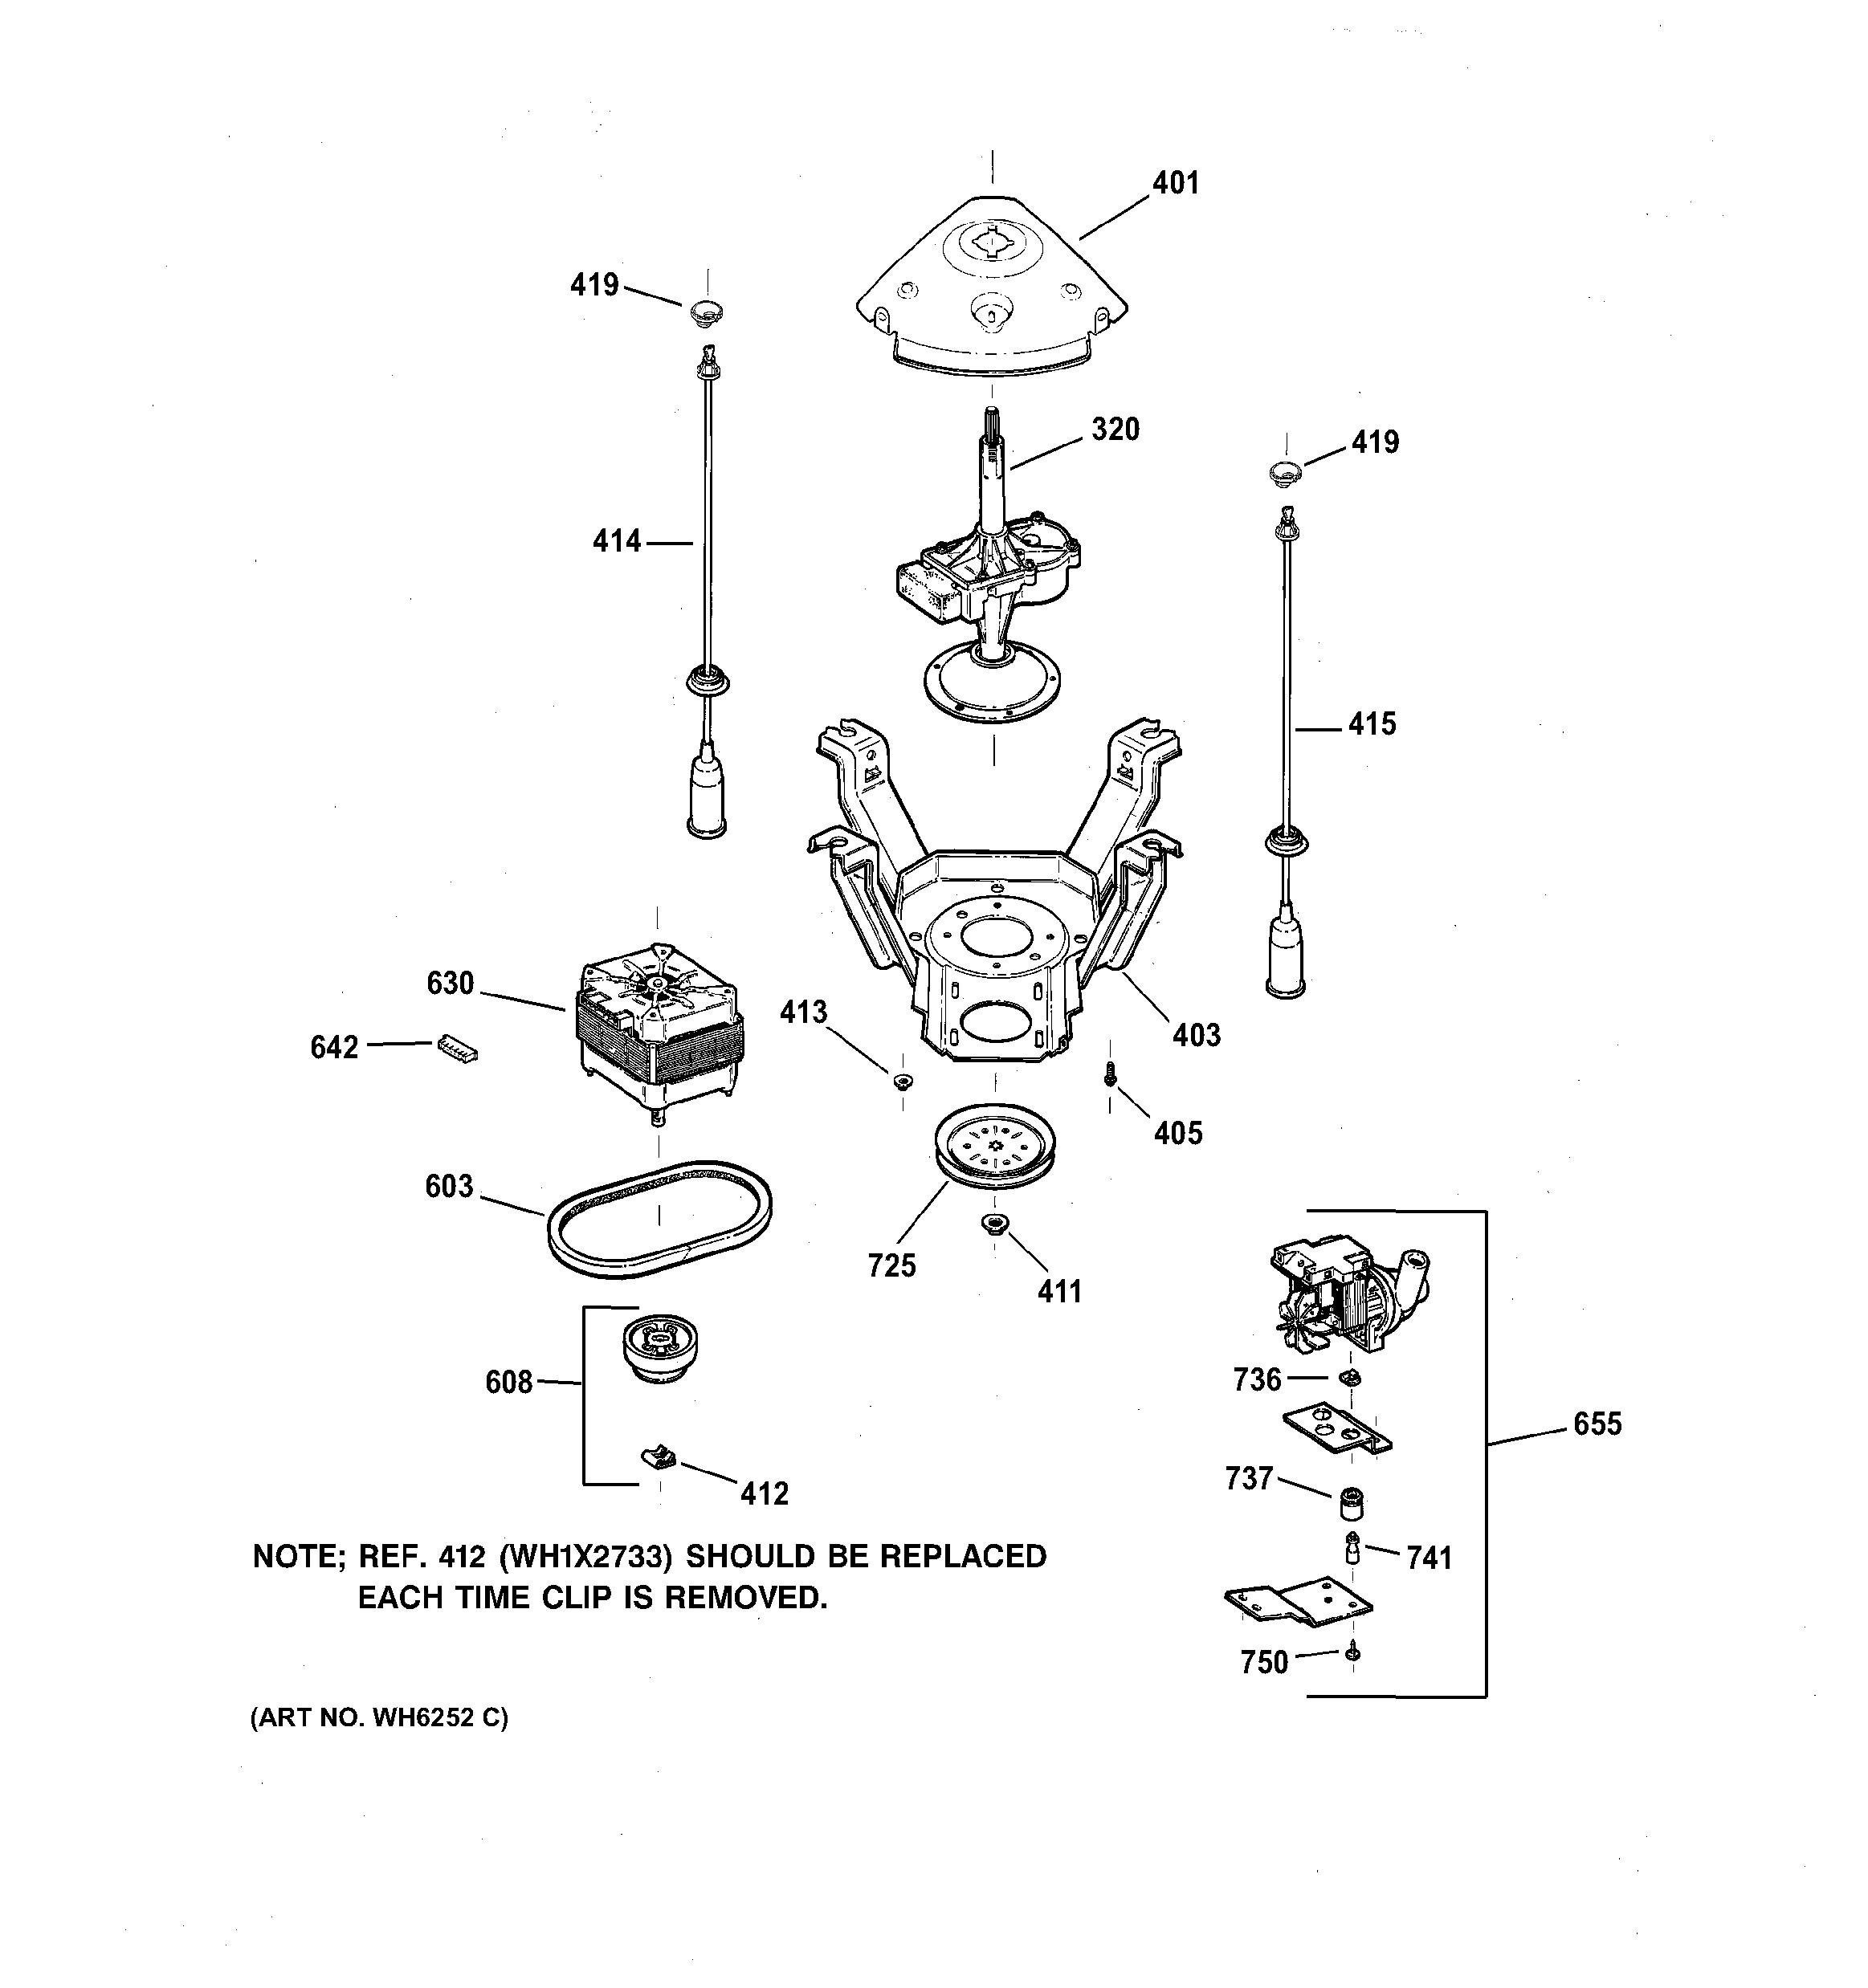 Clutch Components Diagram Porsche 944 Engine Oil Flow Ge Washer Parts Model Wpsq4160taww Of